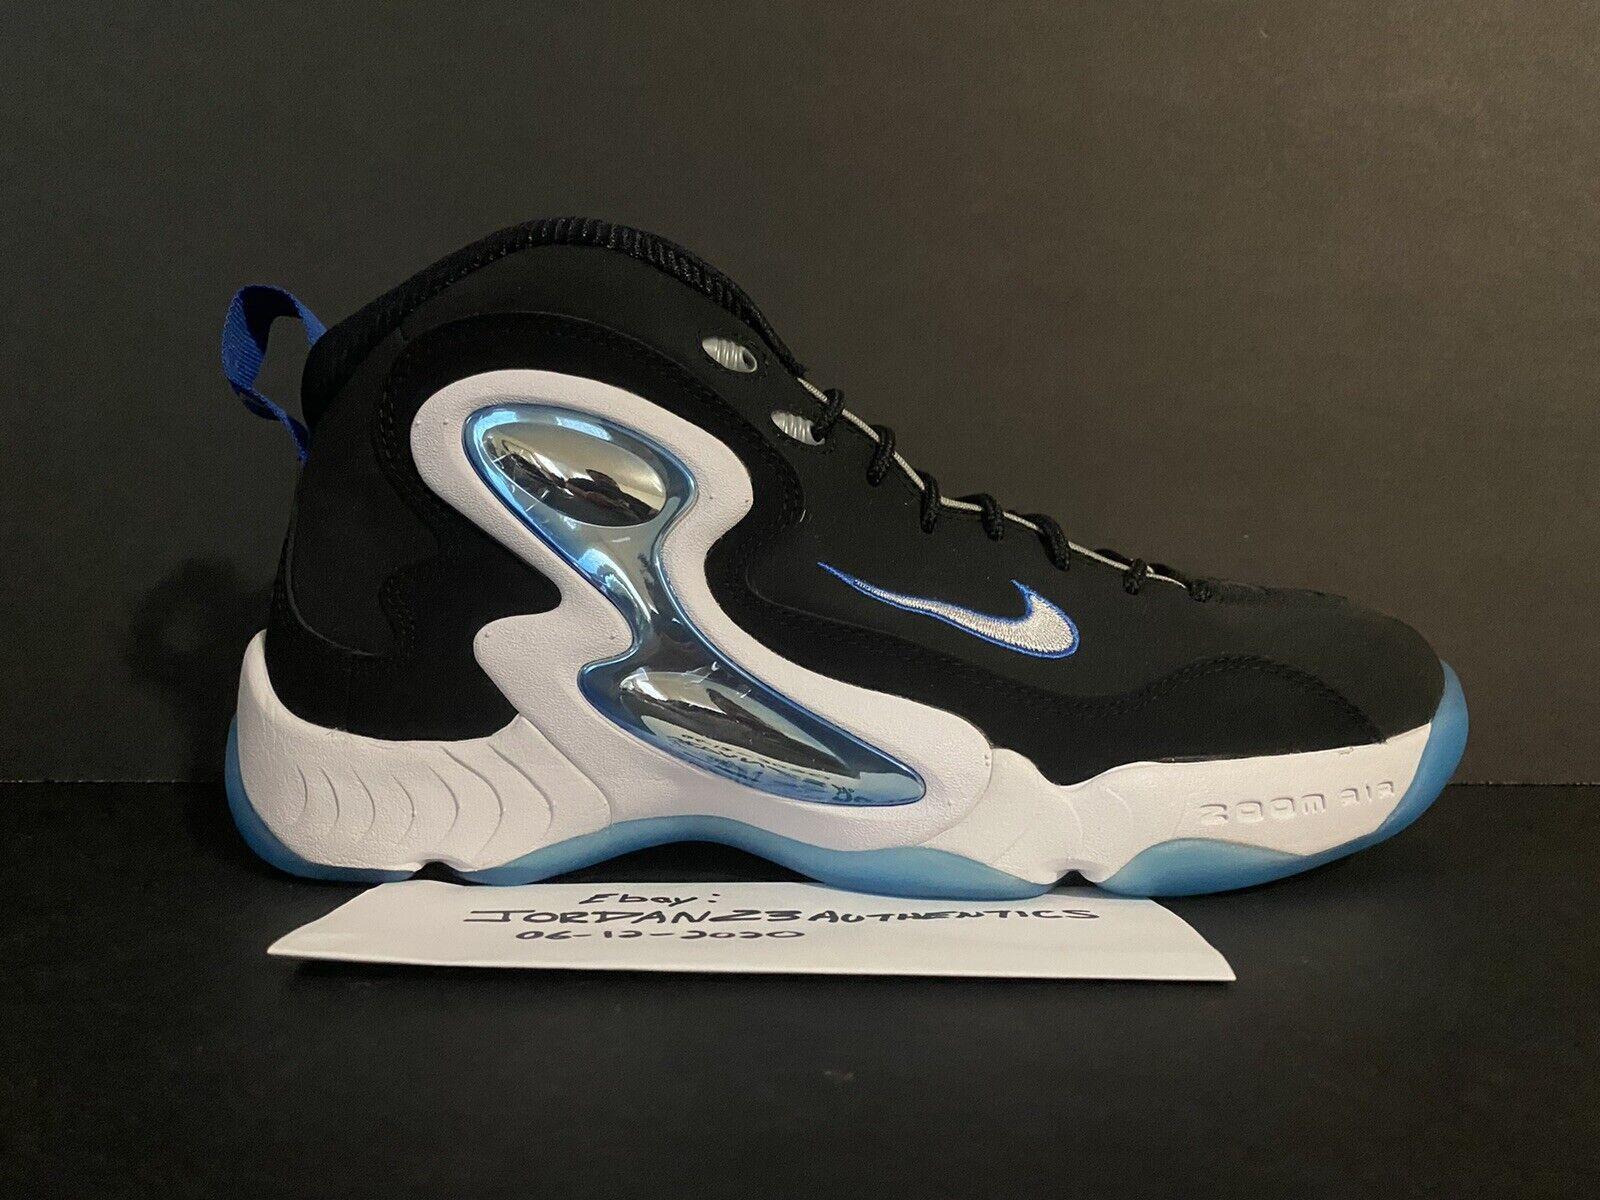 Nike Flight Hawk купить на eBay в